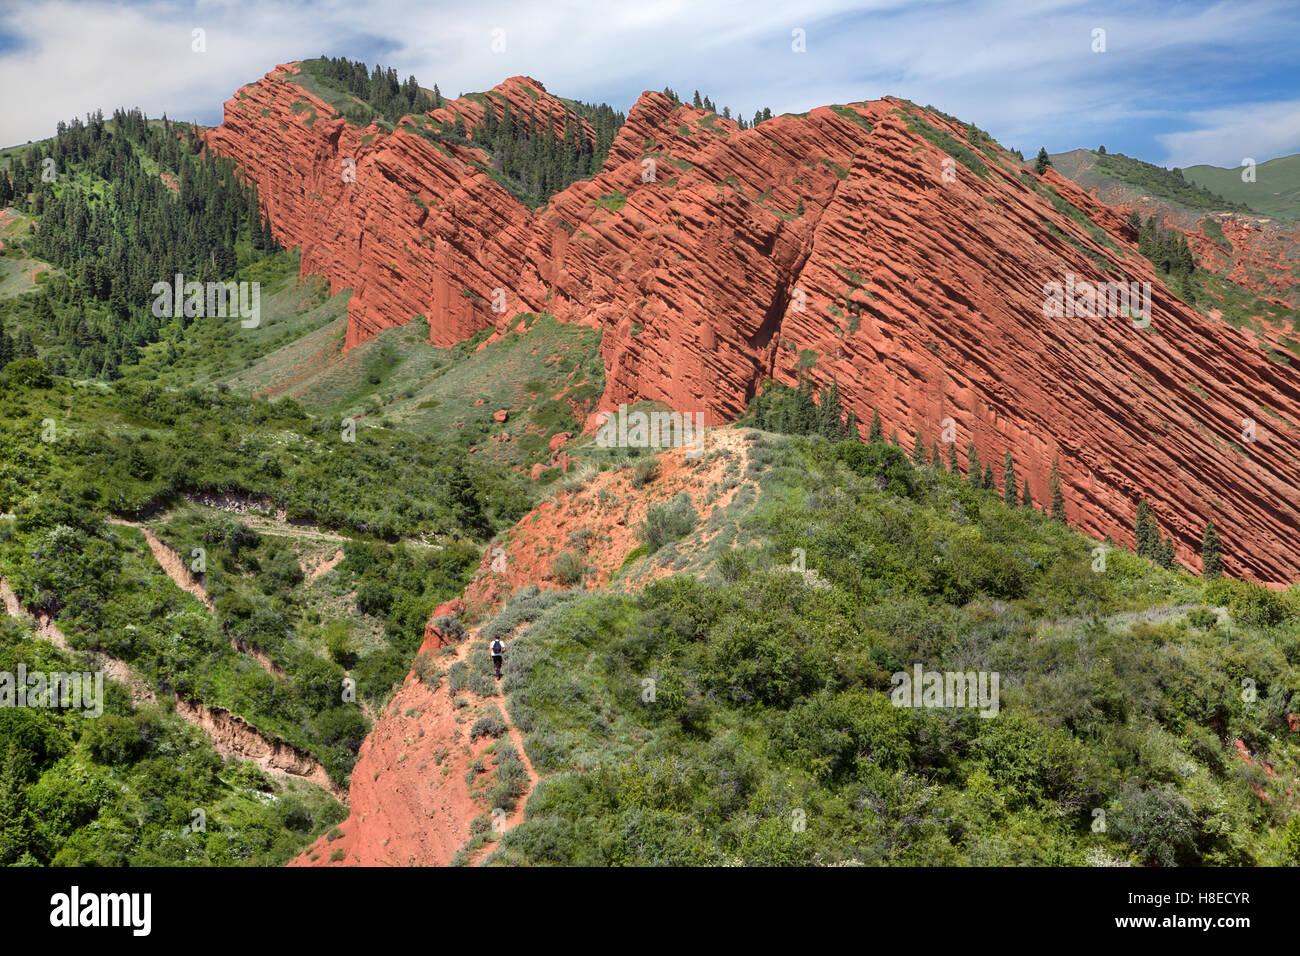 Kirgisistan - Mann in der Nähe von Jeti Ogus Felsen trekking - Reisen in Zentralasien Stockbild